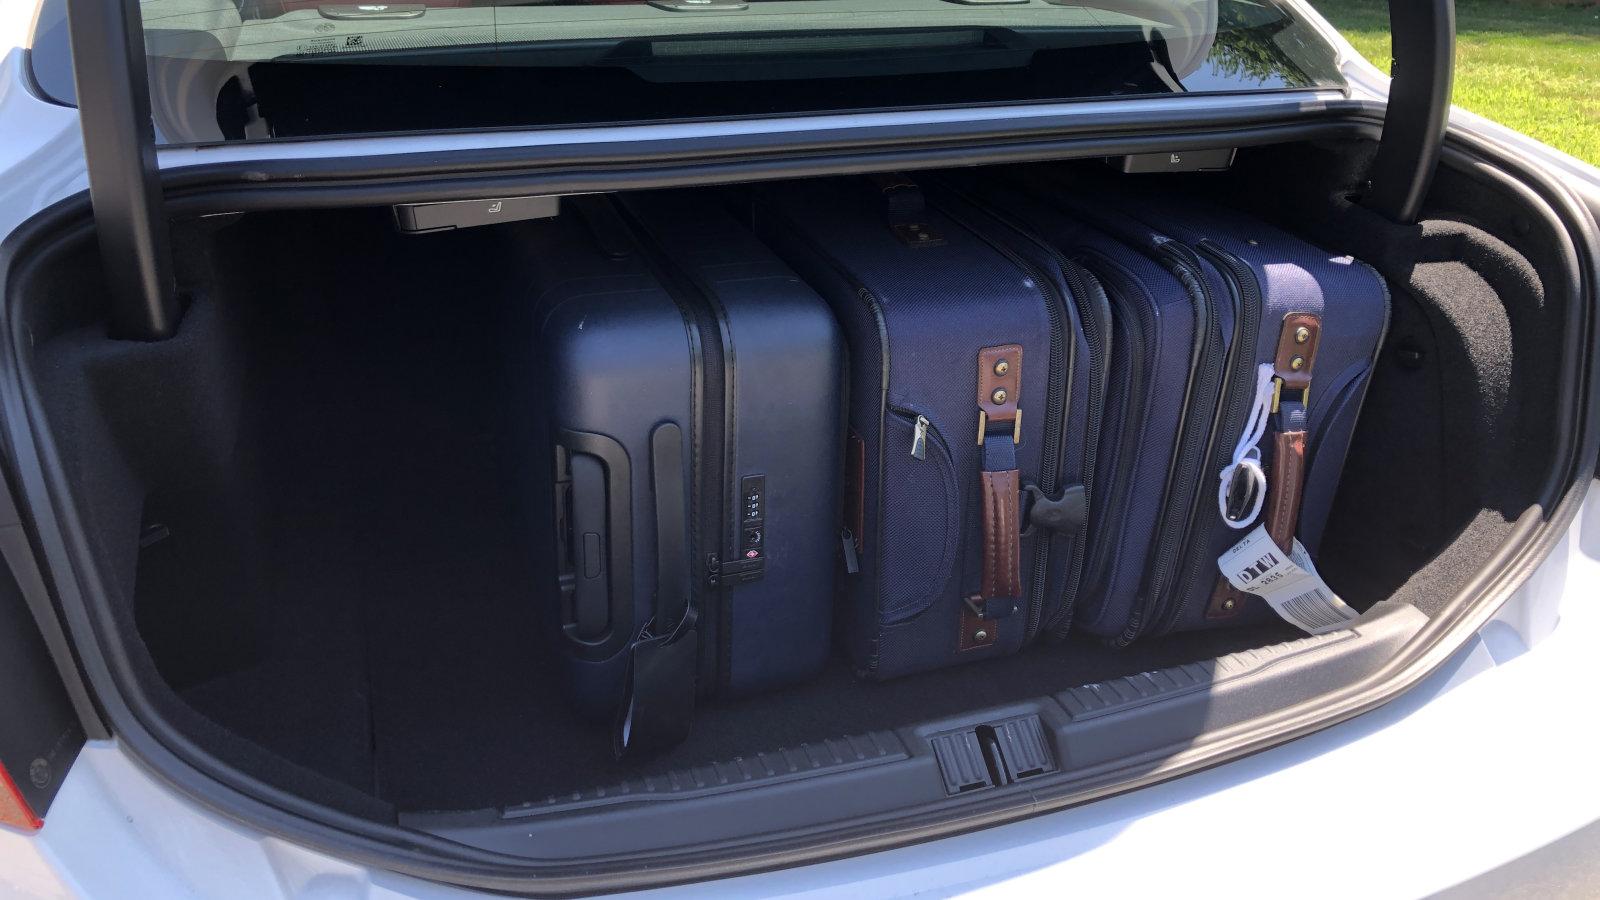 2020 Alfa Romeo Giulia Baggage Examination|Exactly how large is the trunk?